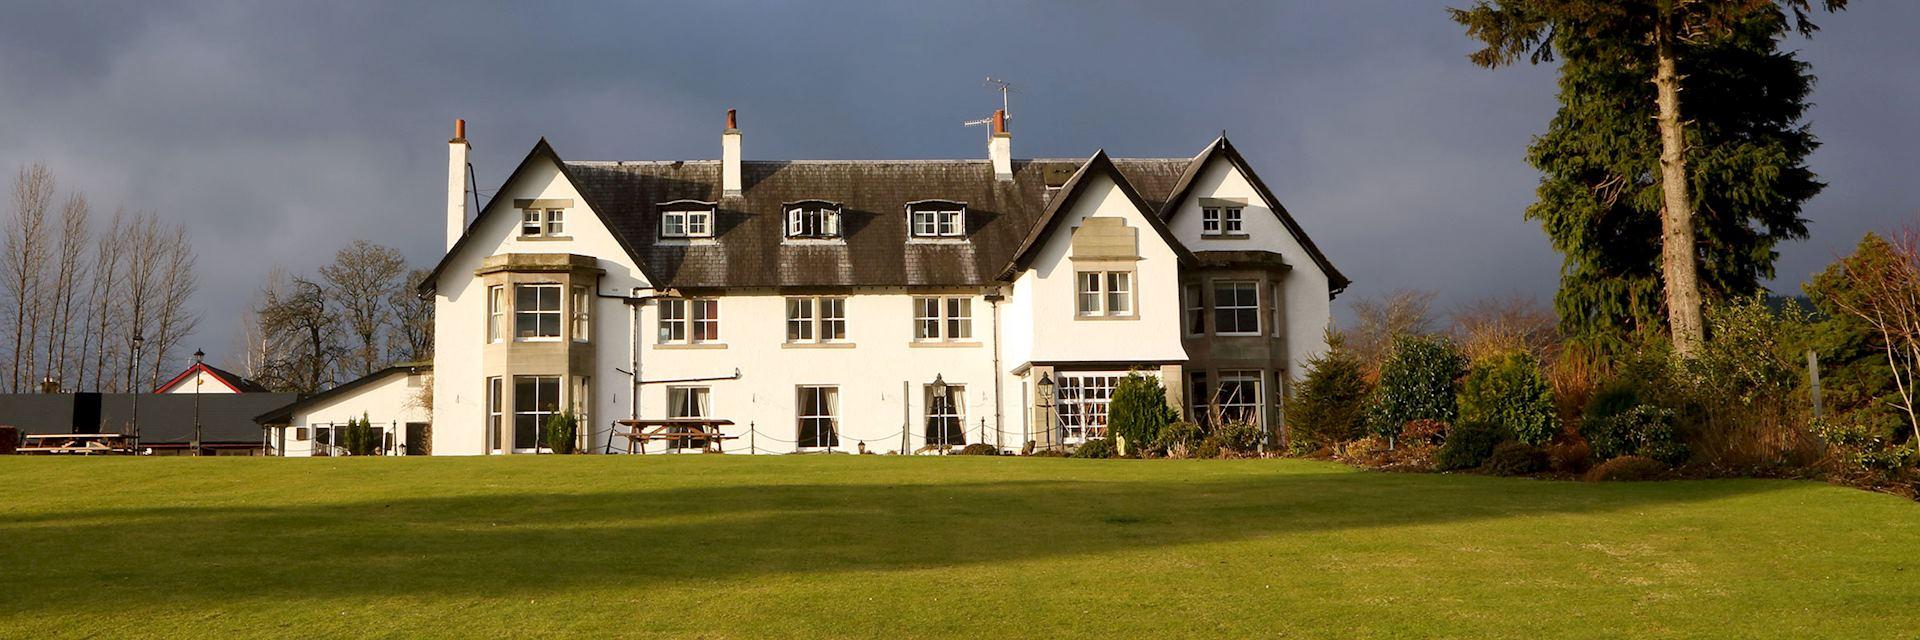 The Lovat, Loch ness